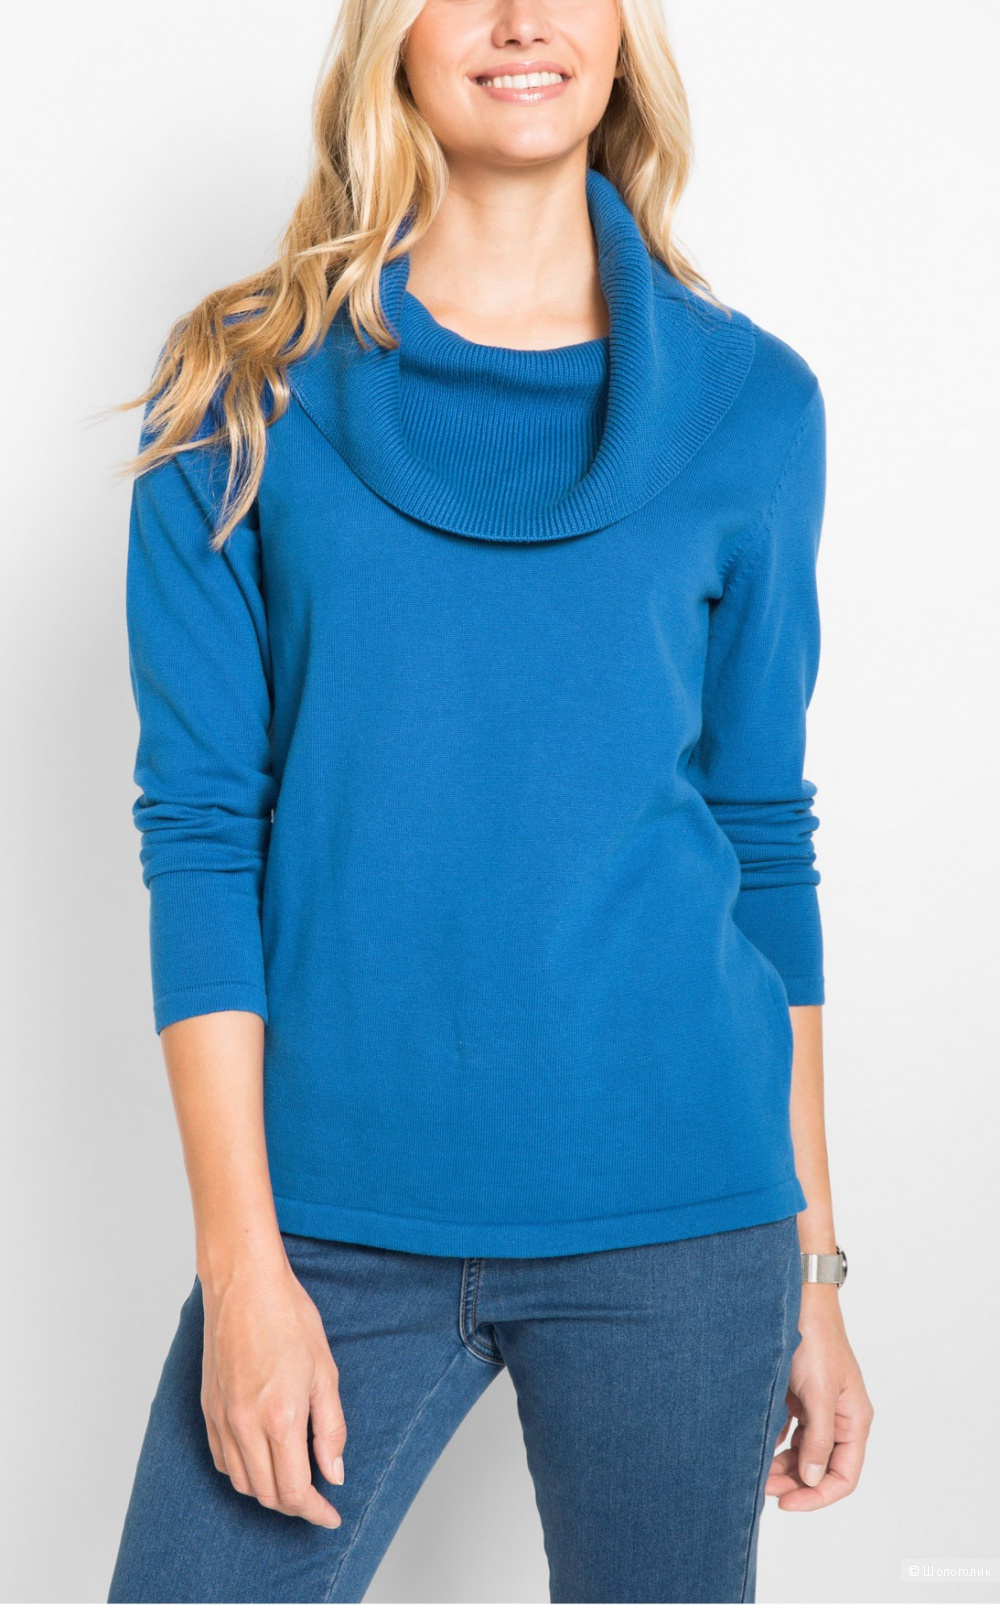 Пуловер, Bonprix, р.42-44-46